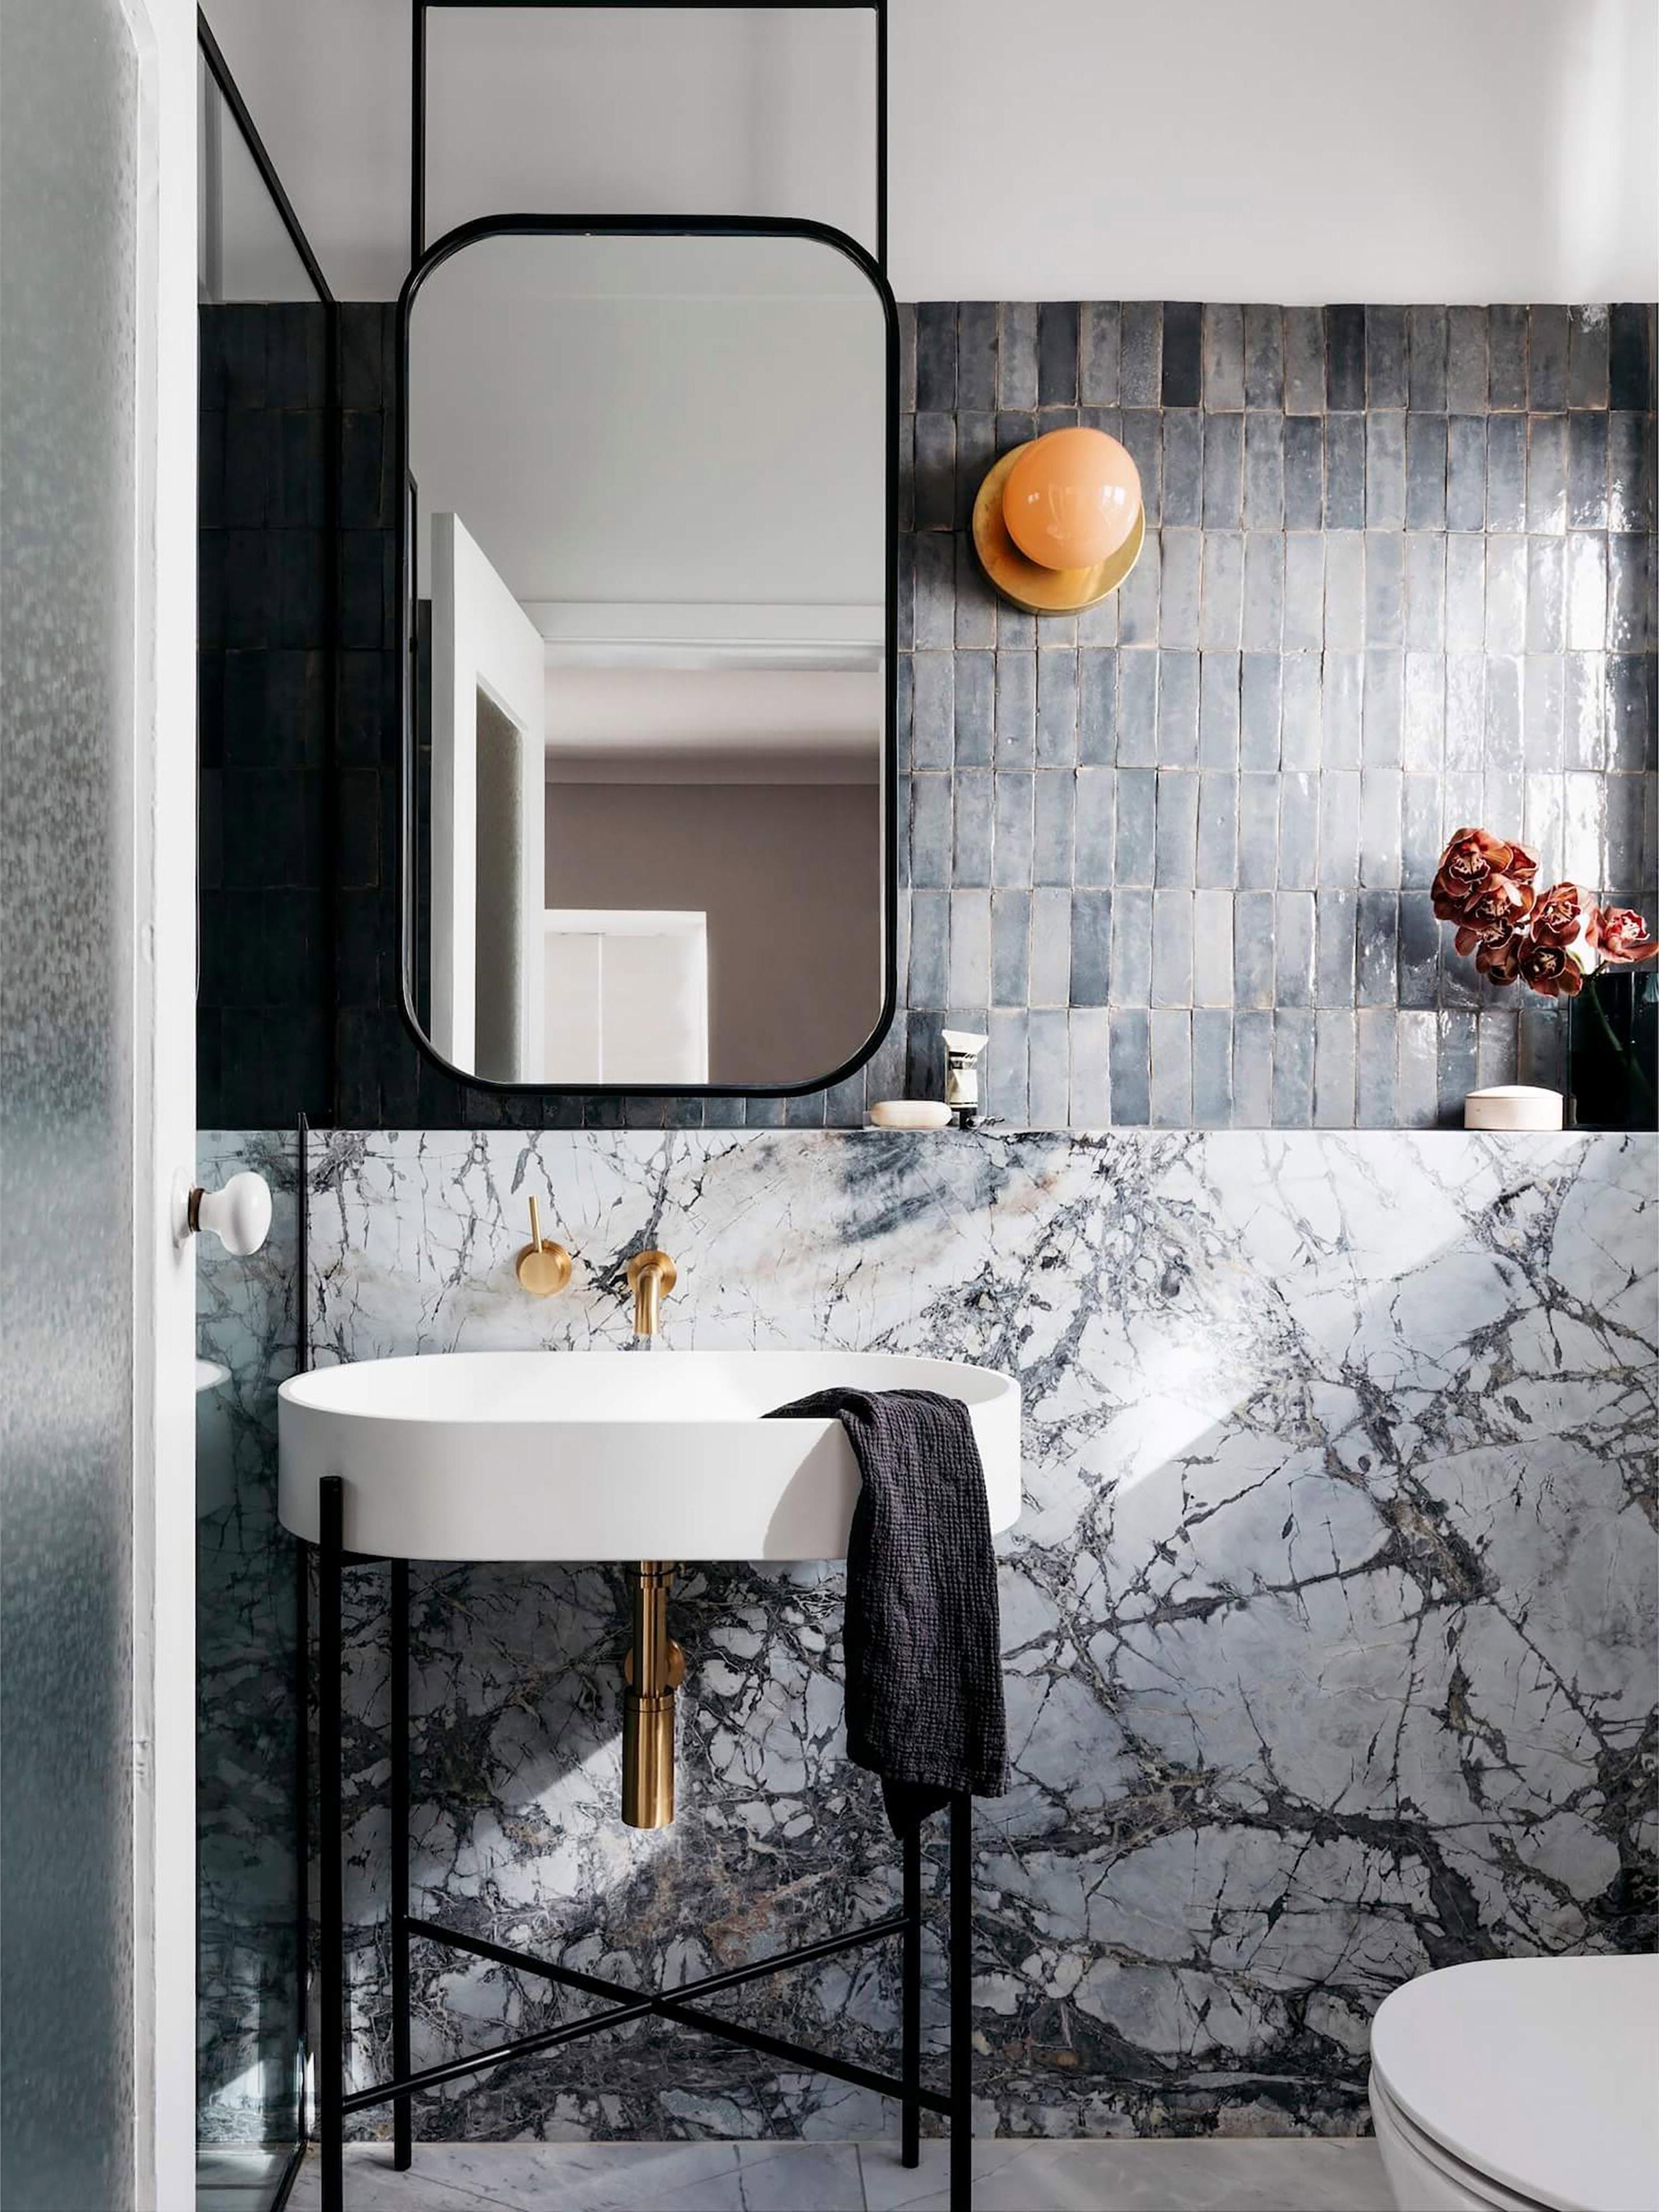 Trendy Wall Mirror For Bathroom Regarding 17 Fresh & Inspiring Bathroom Mirror Ideas To Shake Up Your Morning (View 14 of 20)